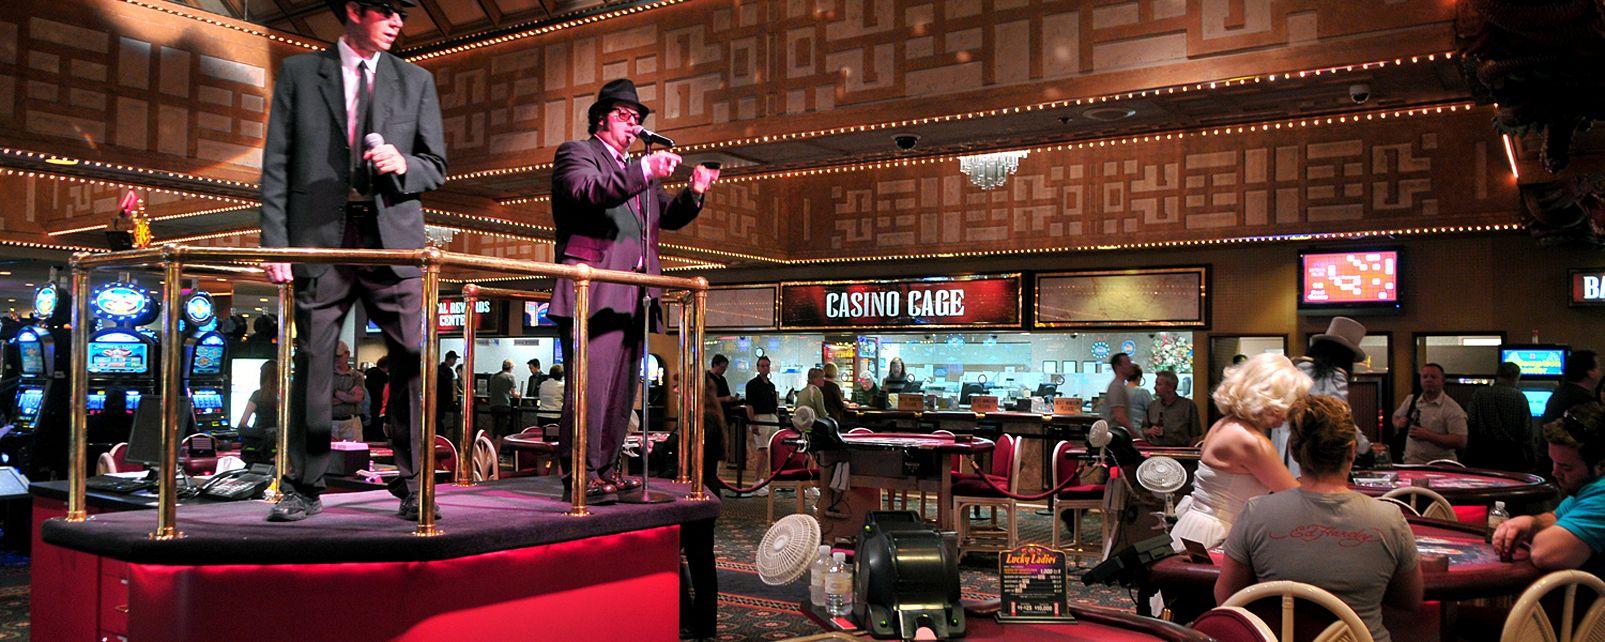 Hôtel Imperial Palace Casino Las Vegas